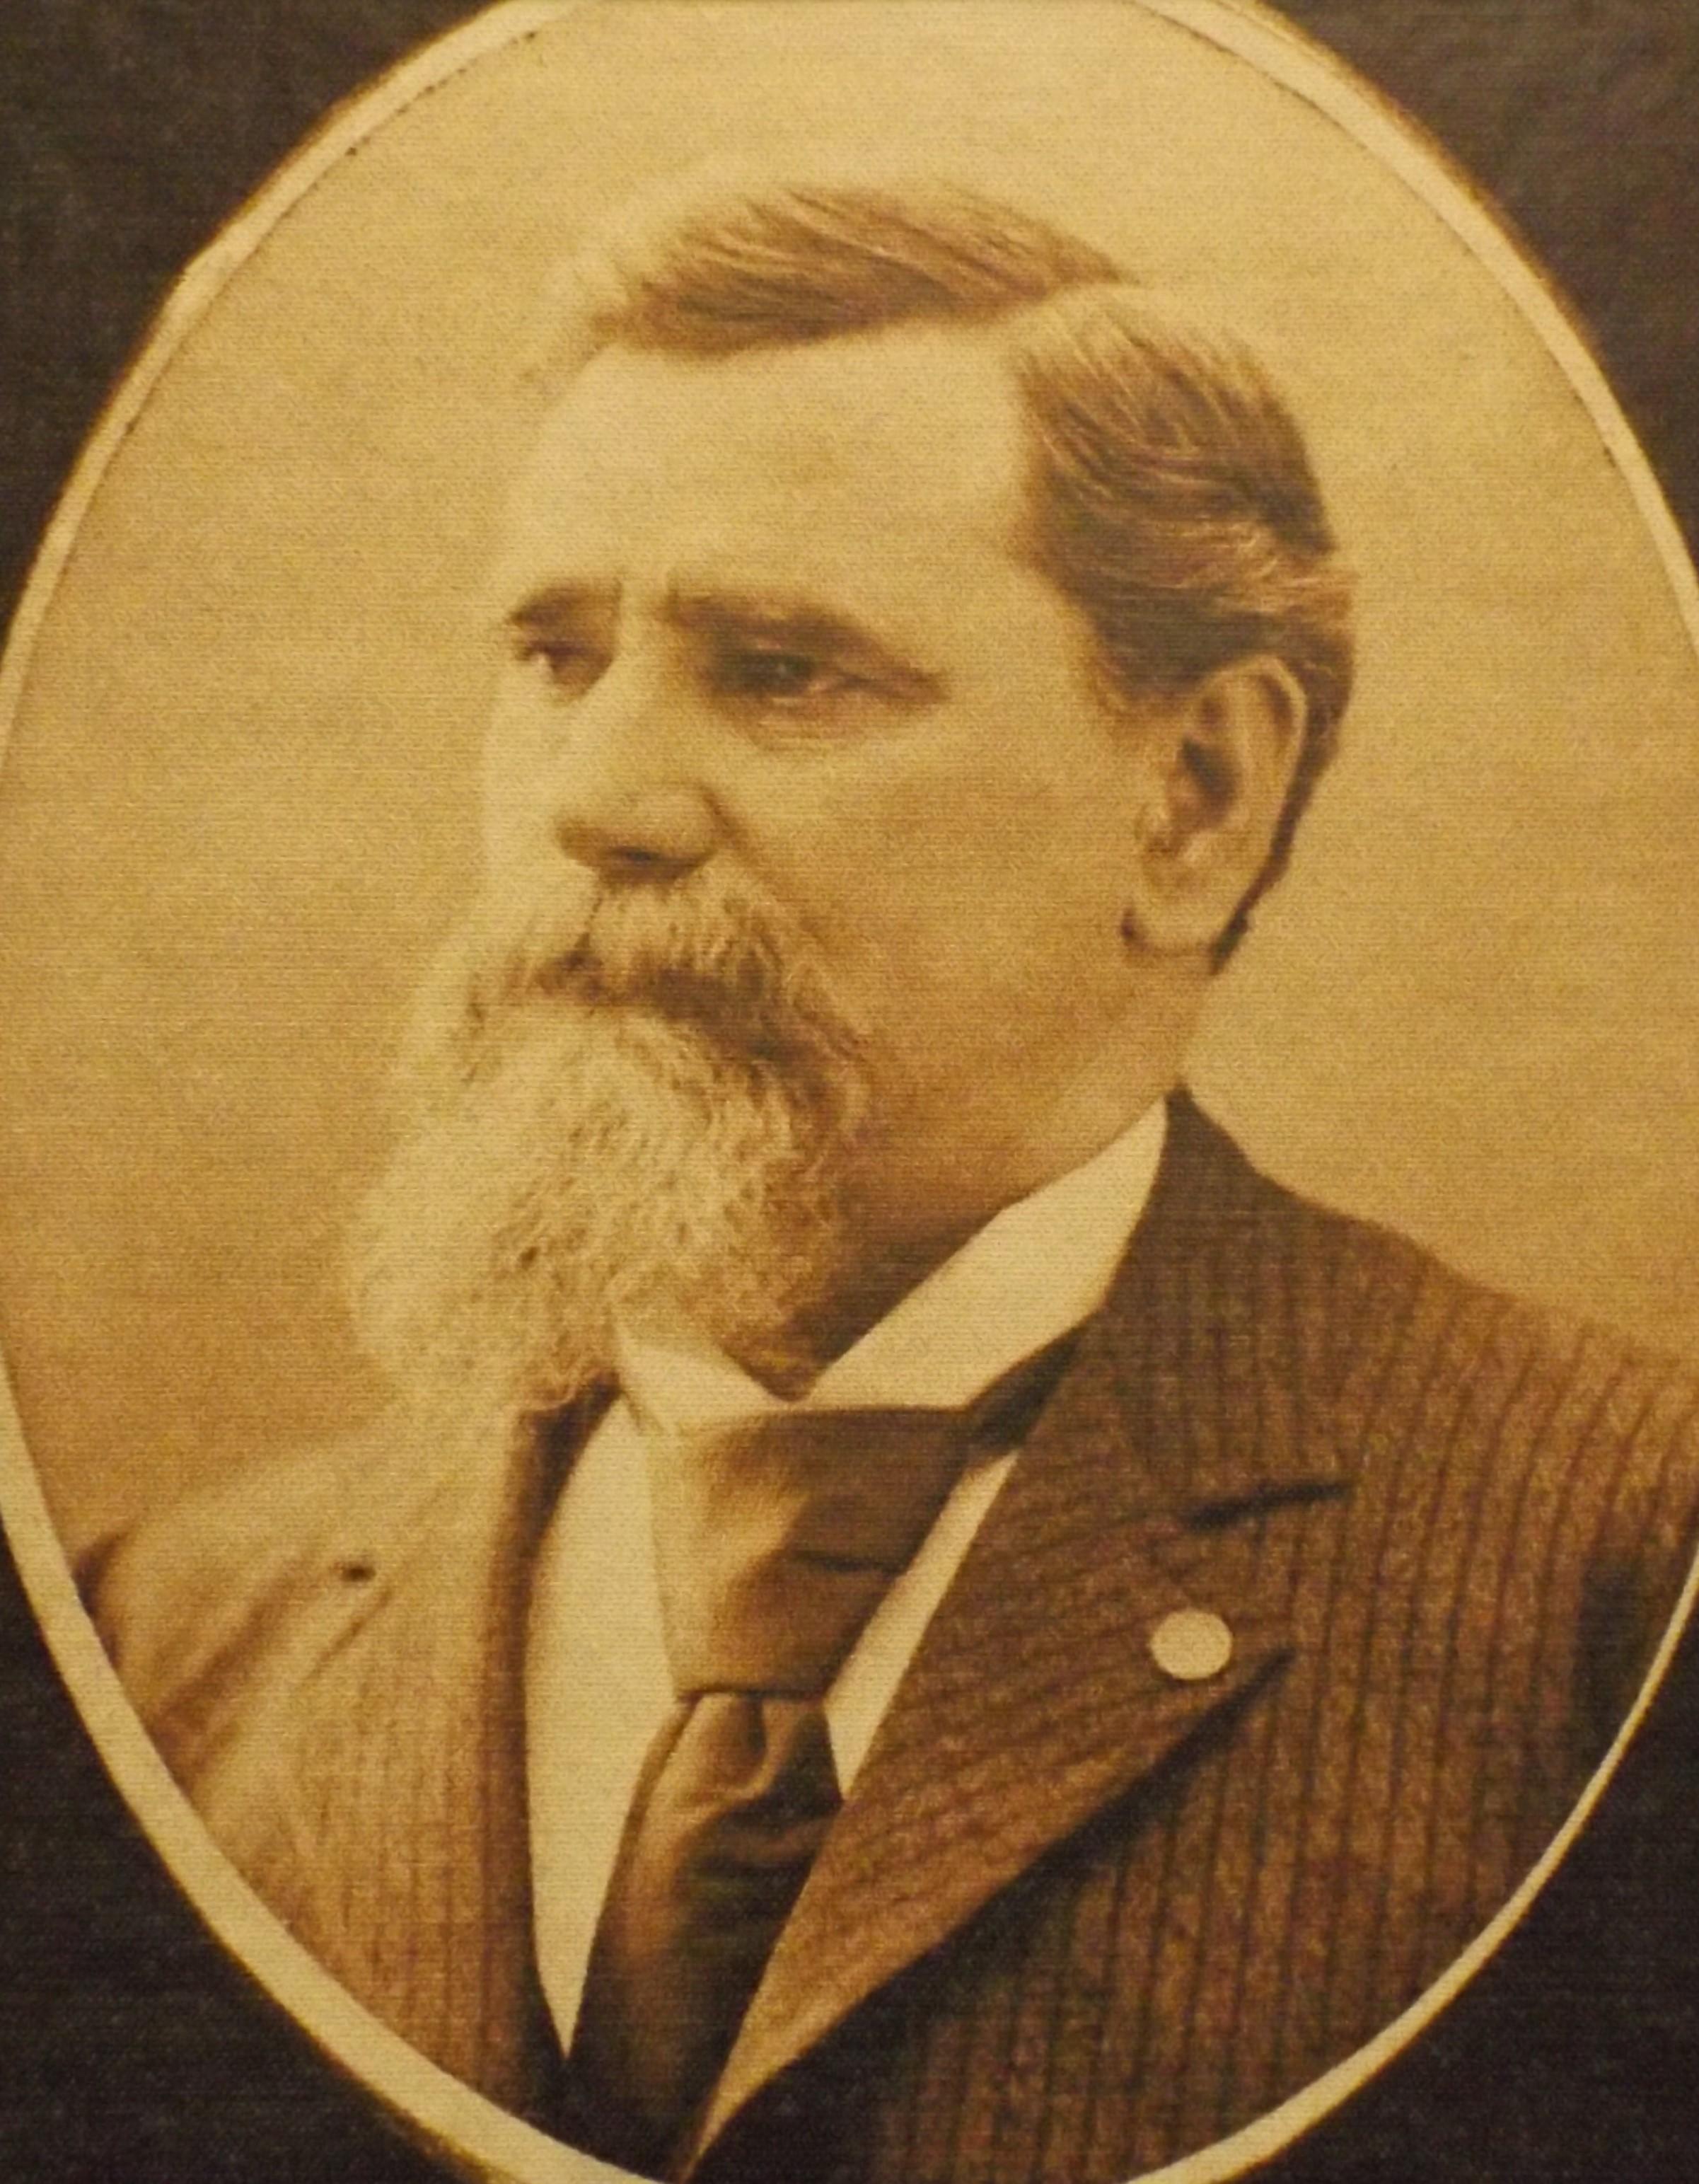 Samuel Llewellyn